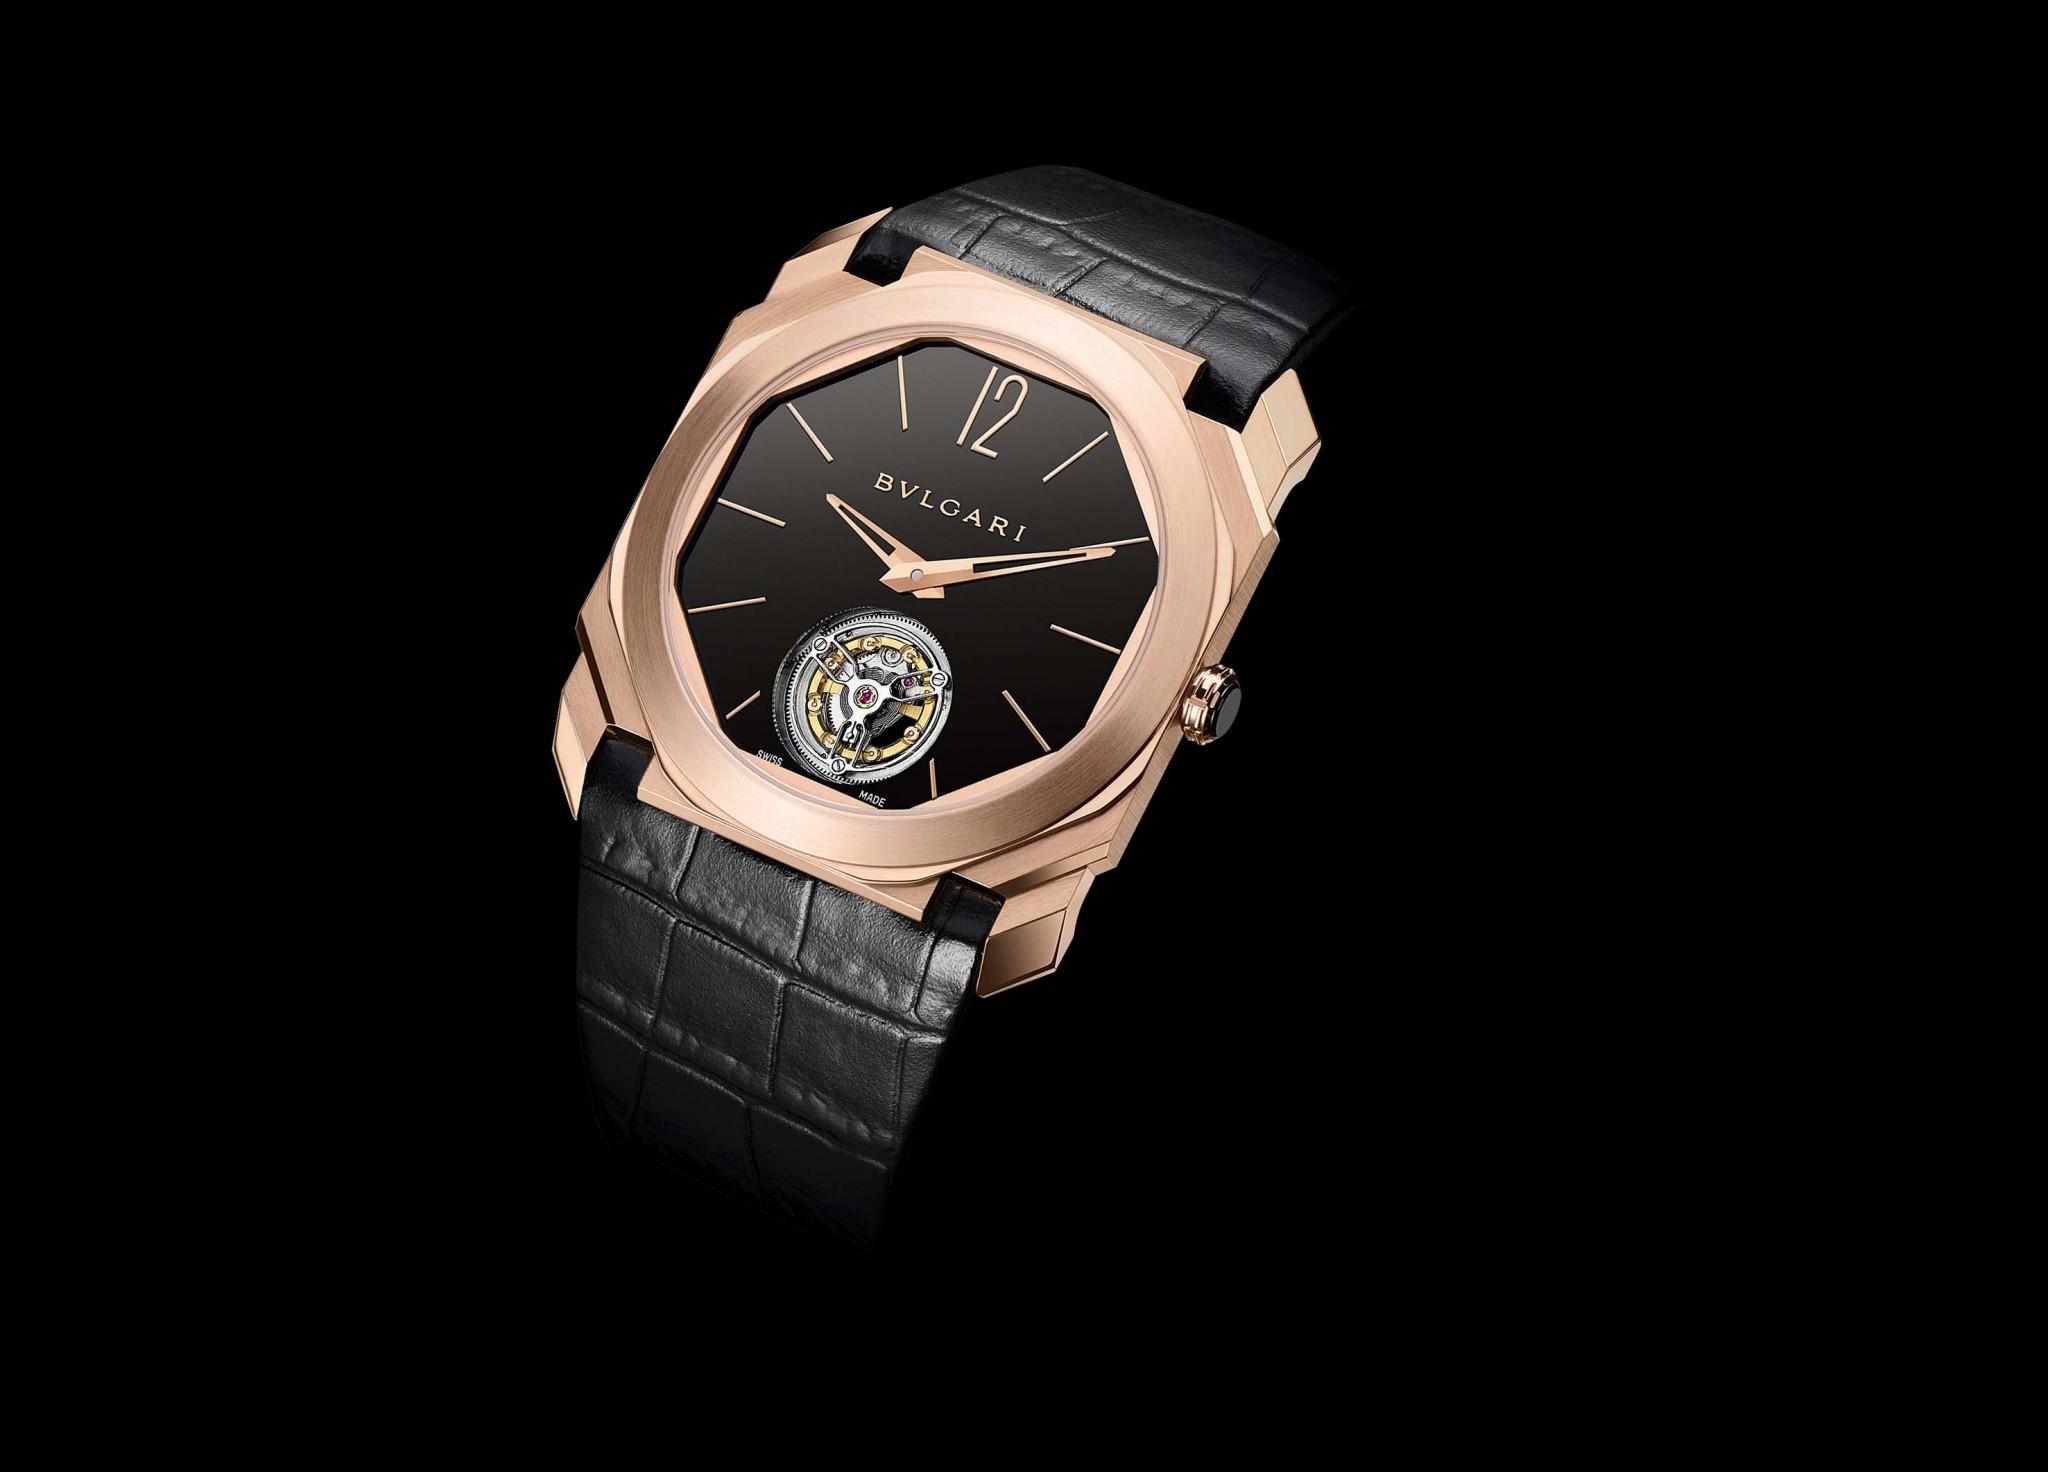 đồng hồ bvlgari Octo Finissimo Tourbillon 36.60mm